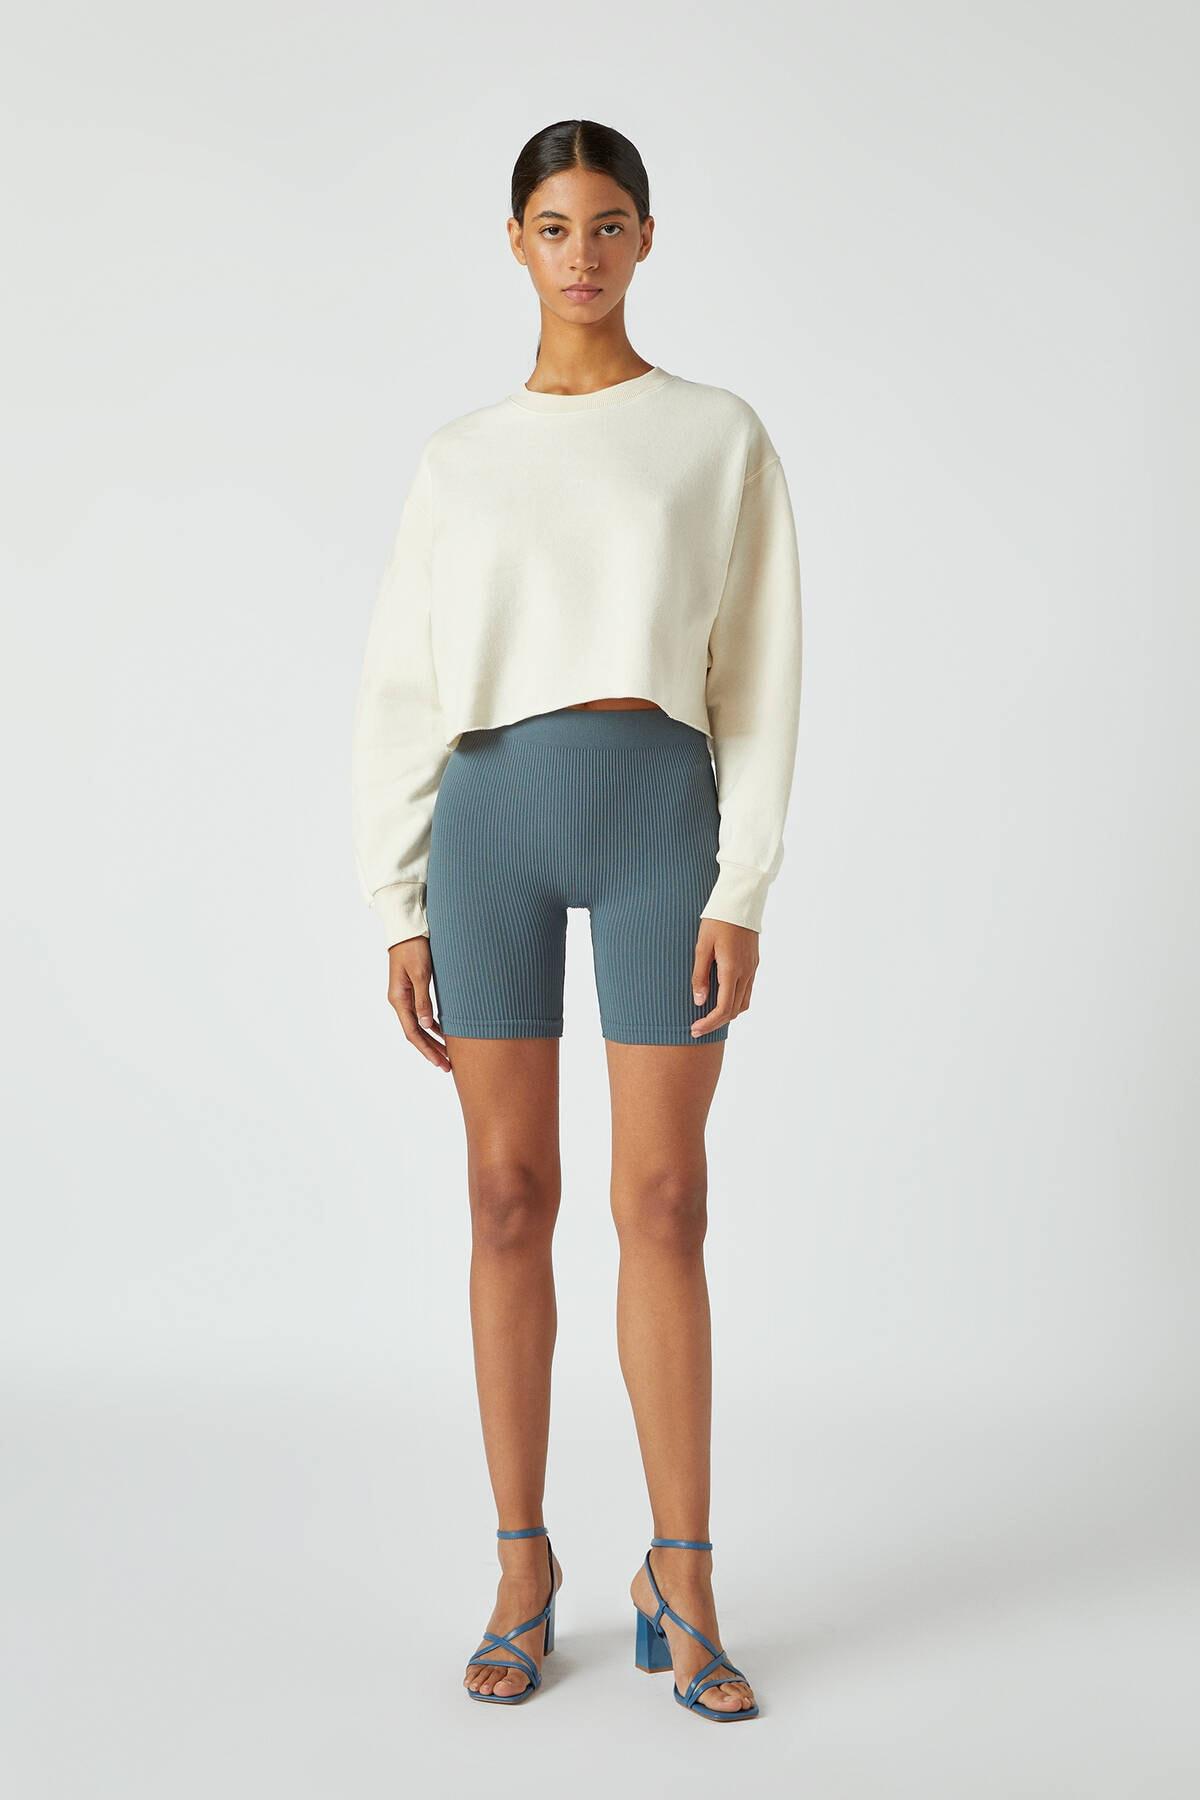 Pull & Bear Kadın Buz Rengi Rahat Crop Fit Sweatshirt 09594315 1